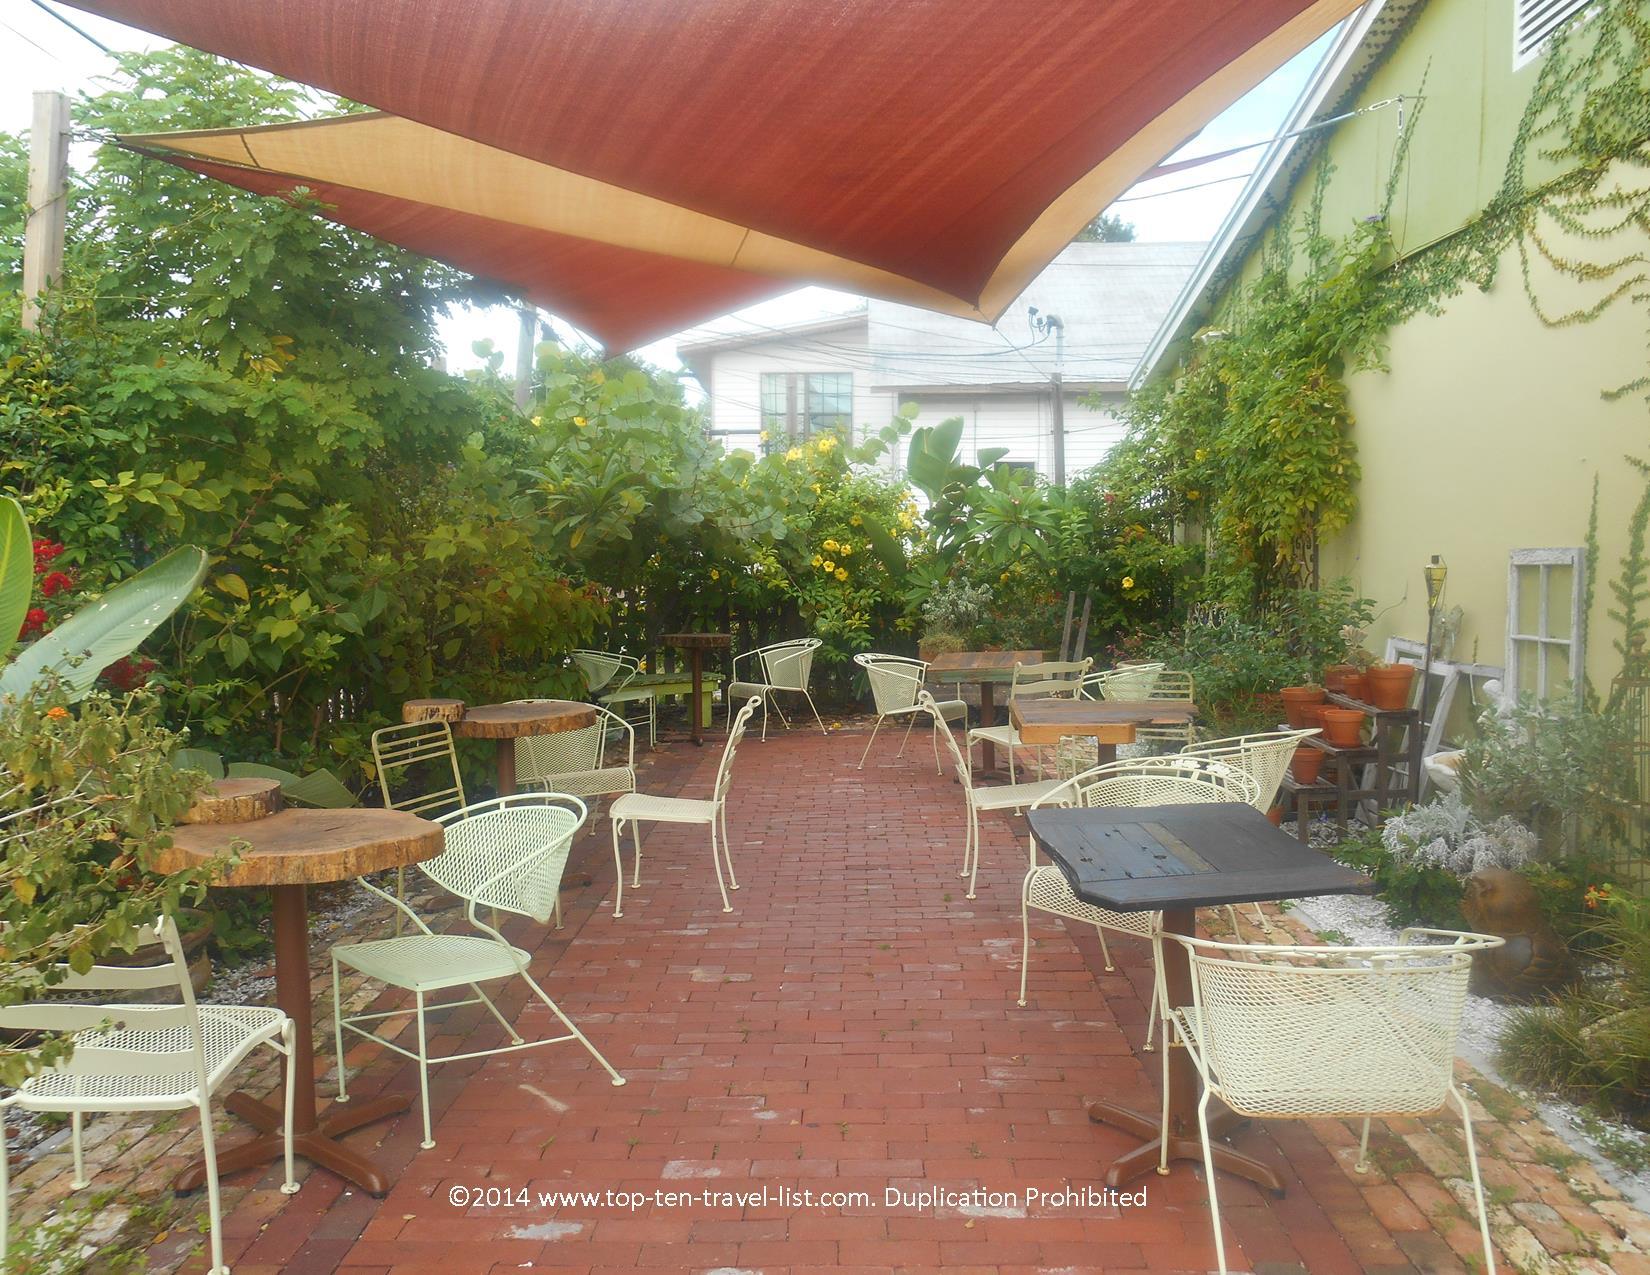 Outdoor patio at Eco Beans in Tarpon Springs, Florida